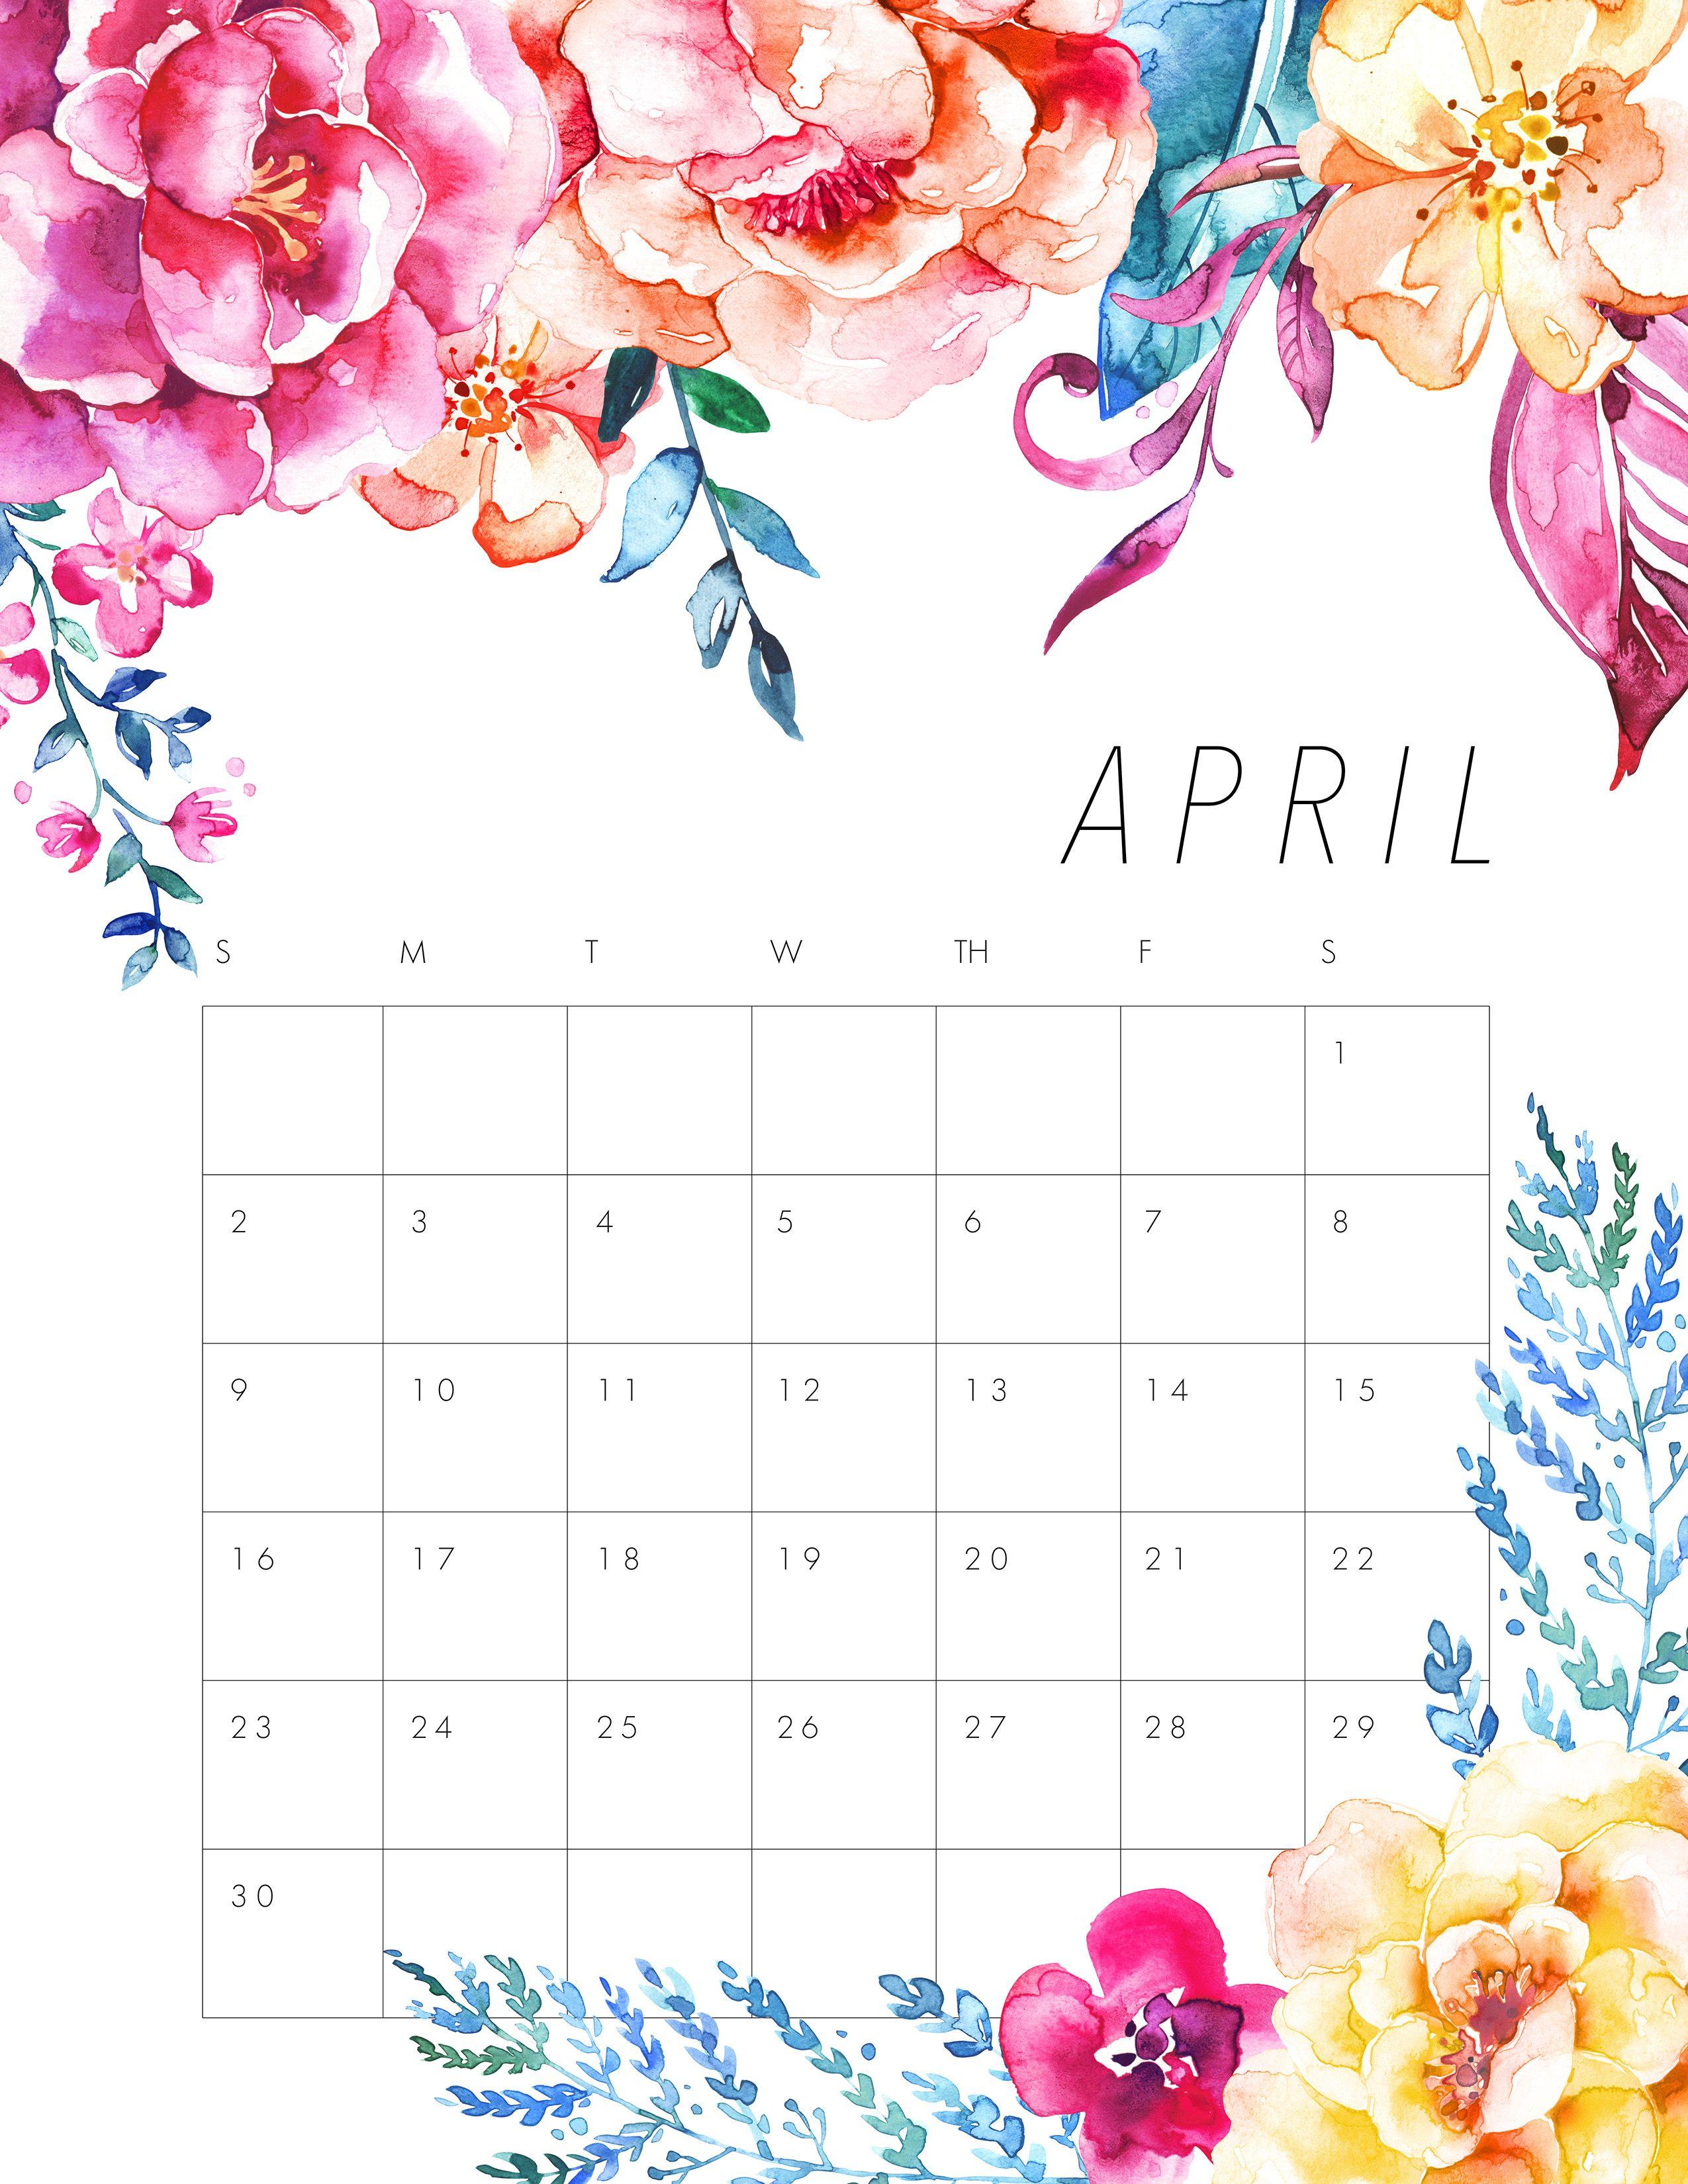 thecottagemarket.com 2017Calendars TCM-2017-4-april.jpg | Stationary ...